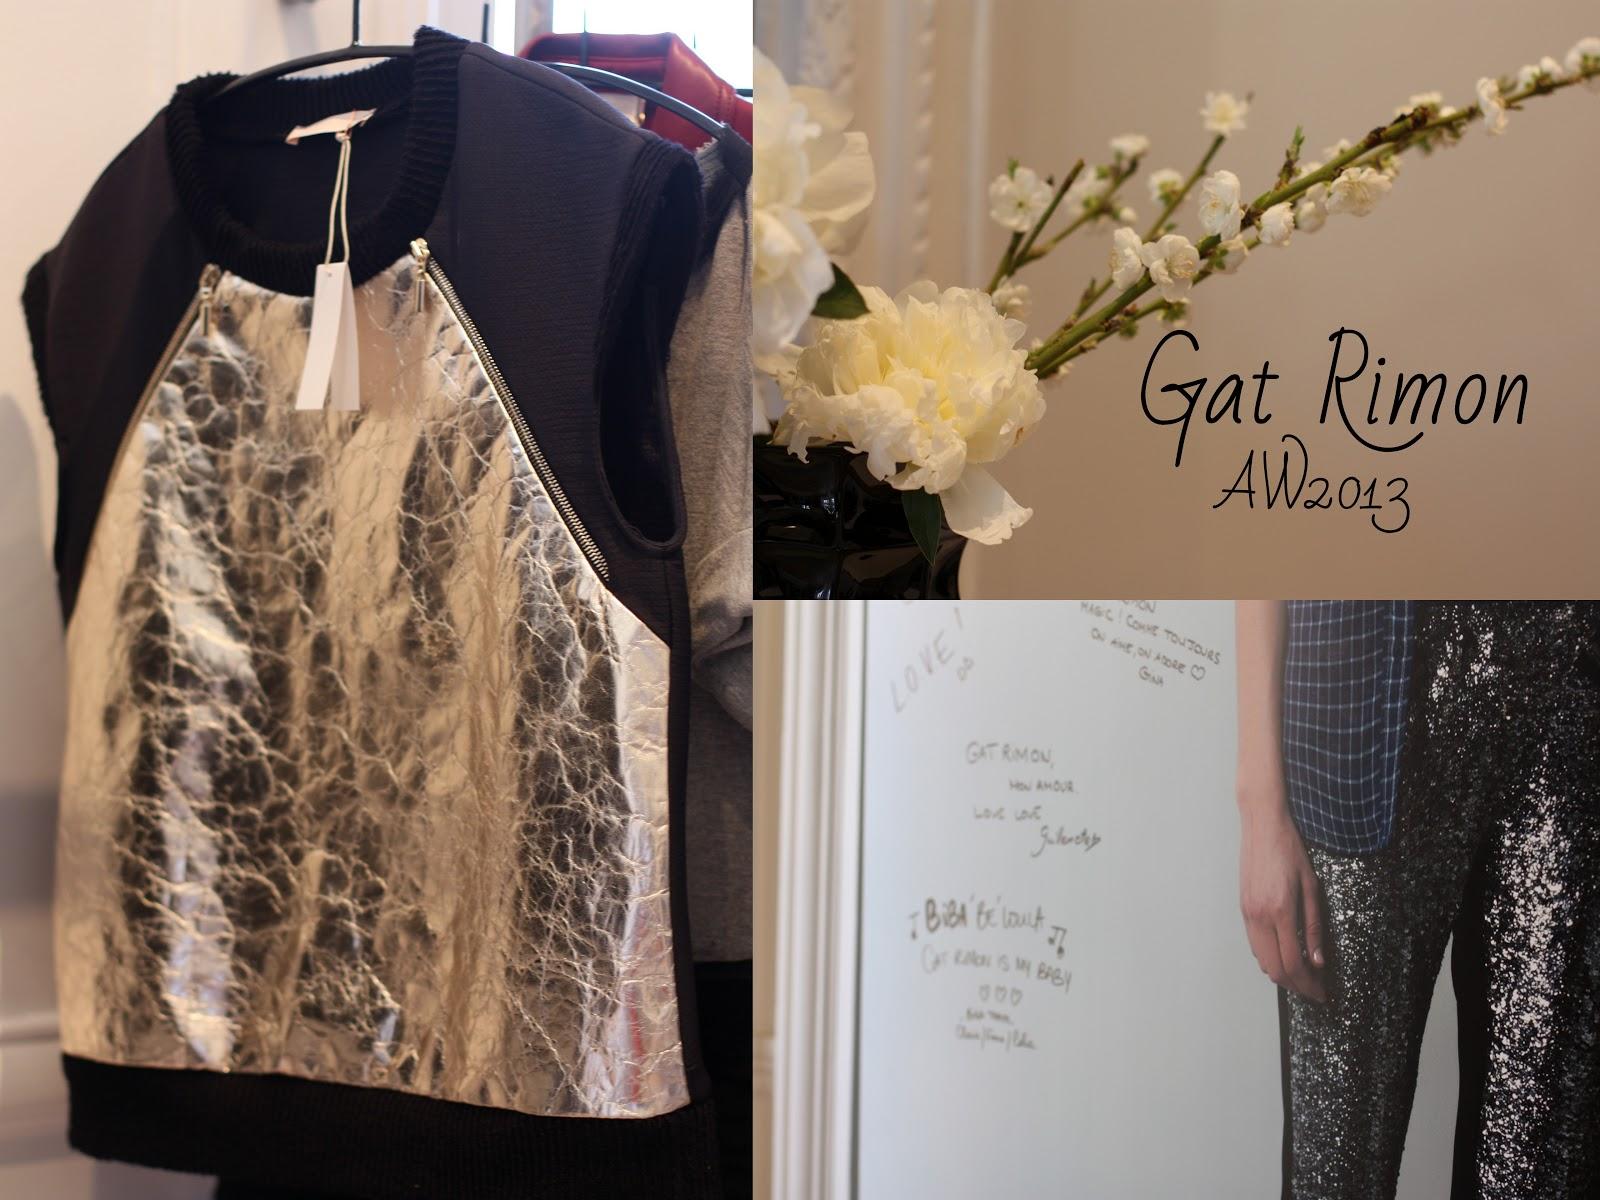 Gat Rimon AH 2013 - Blog Mode